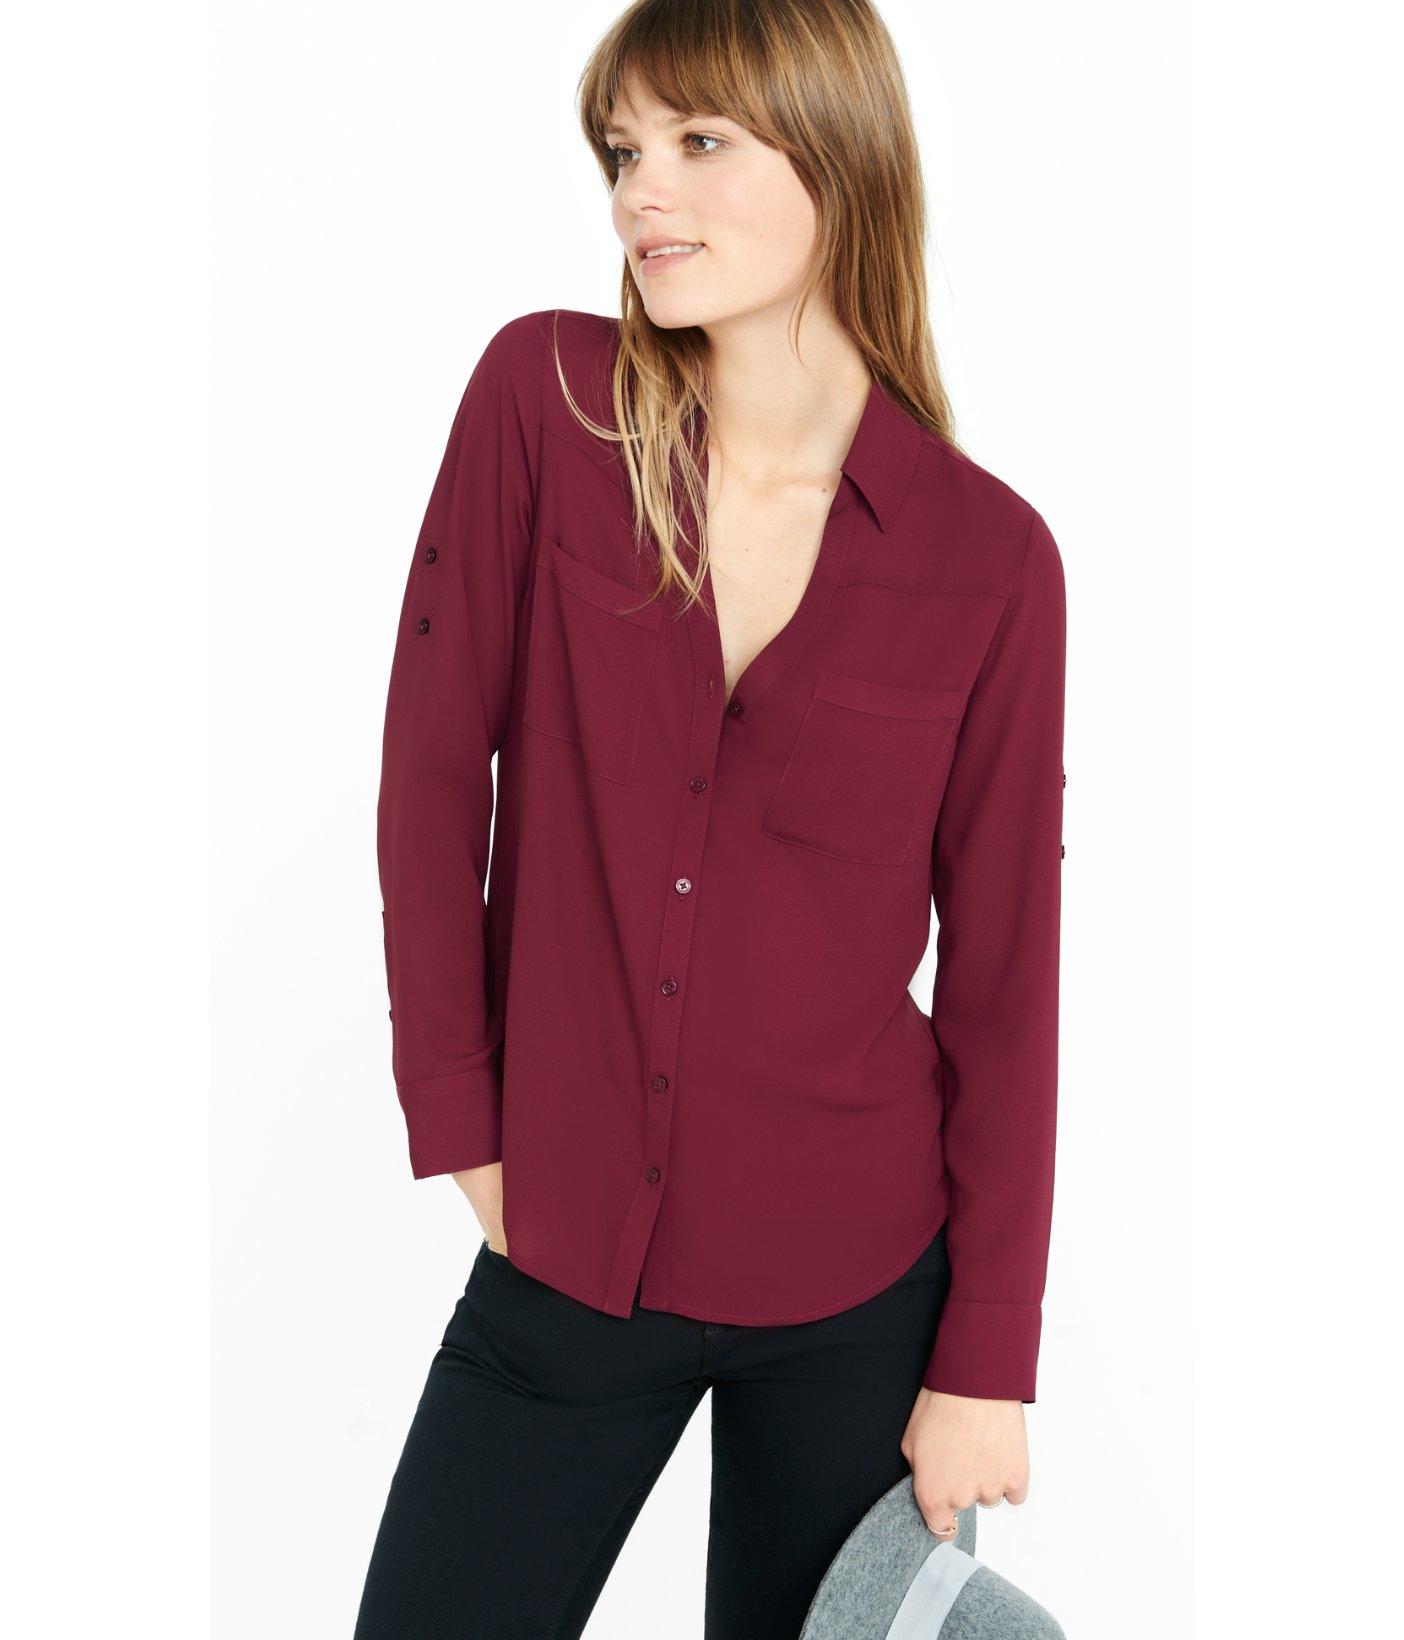 158ffdf4db5f ... Lyst Express Slim Fit Convertible Sleeve Portofino Shirt in Purple